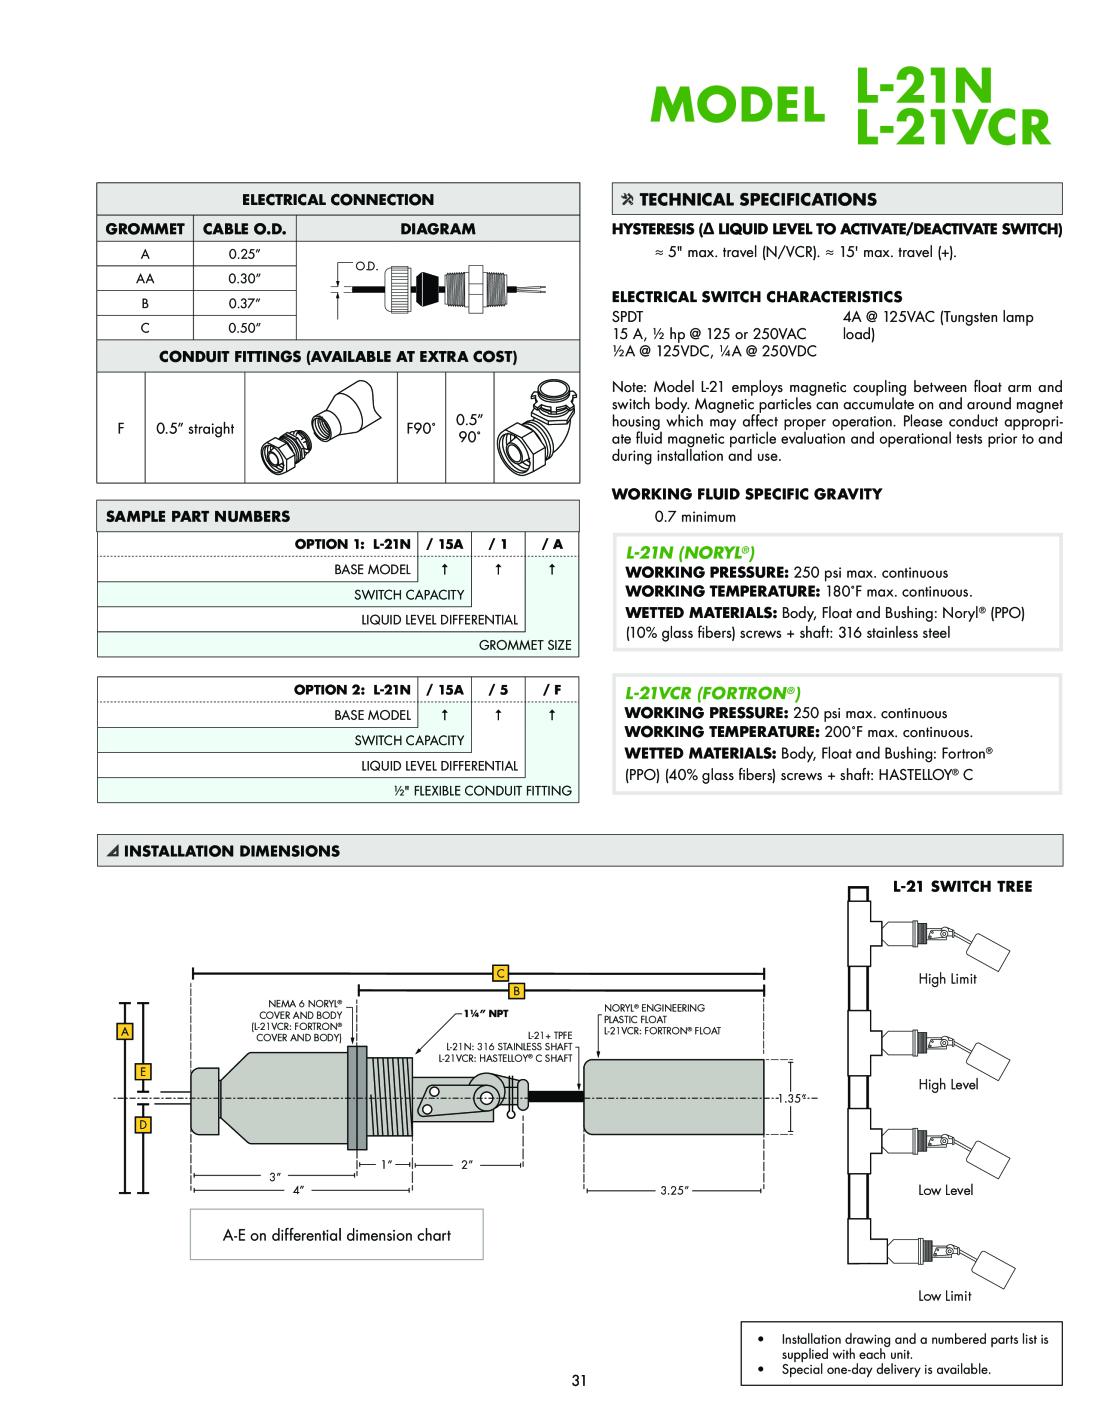 Wiring Motor Heaters besides Pool Wiring Diagrams besides Wiring Diagram For Waterway Spa Pump likewise 99p36s as well R63mwena 4727 Spa Motor Wiring Diagram. on jacuzzi pump motors wiring diagrams